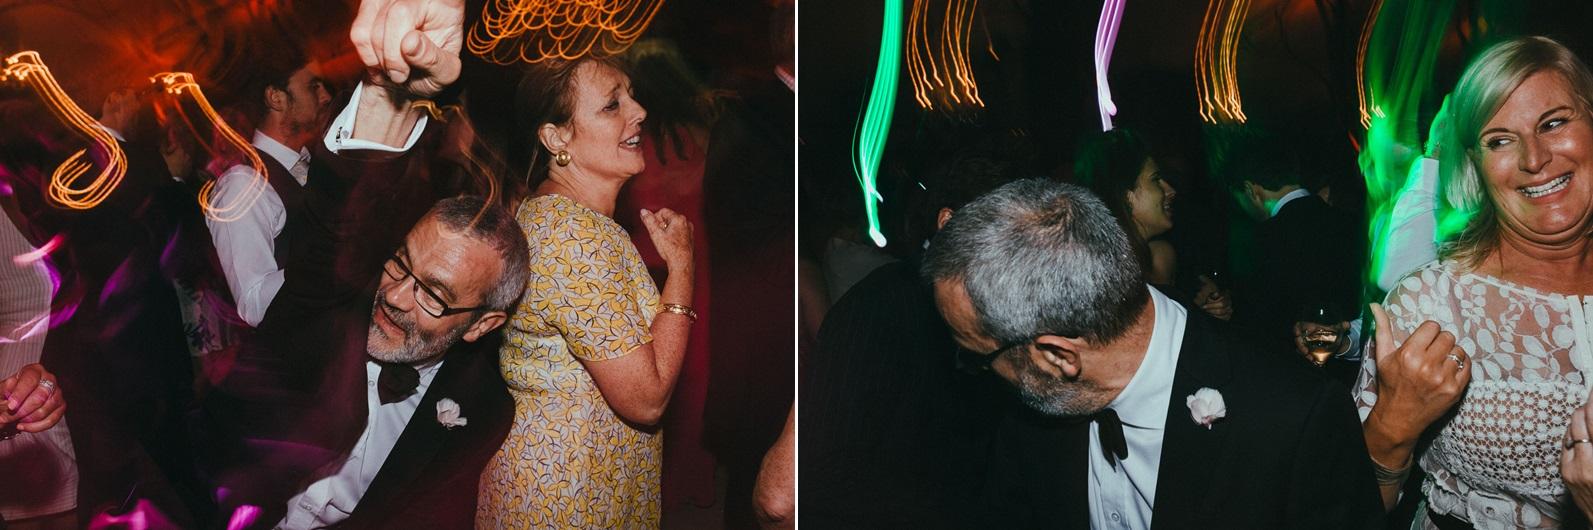 chateau-wedding-photography (171).jpg